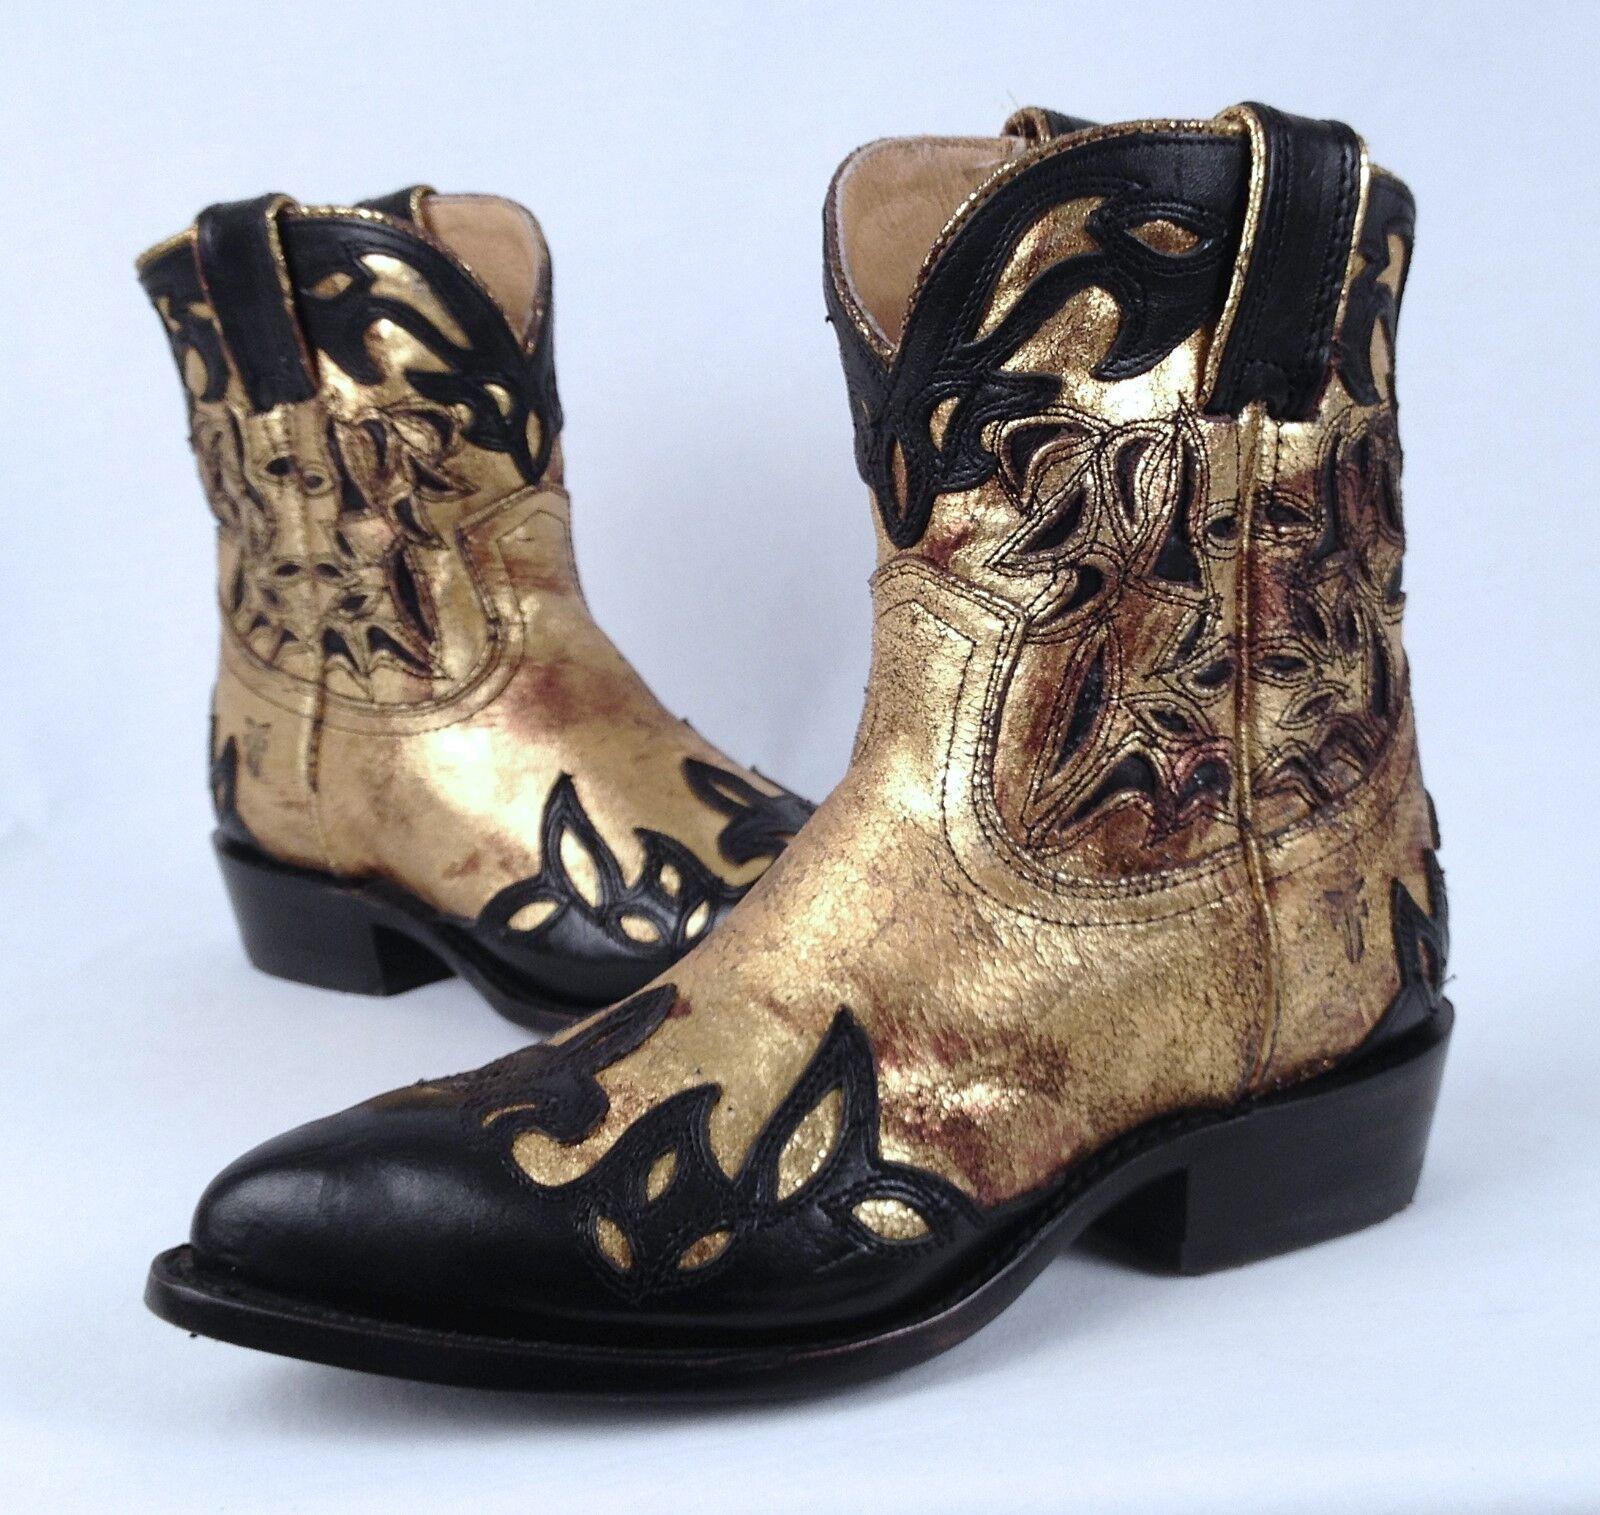 NEW  Frye 'Billy' Short Boot- Vintage Black gold -Size 6 B  (B61)